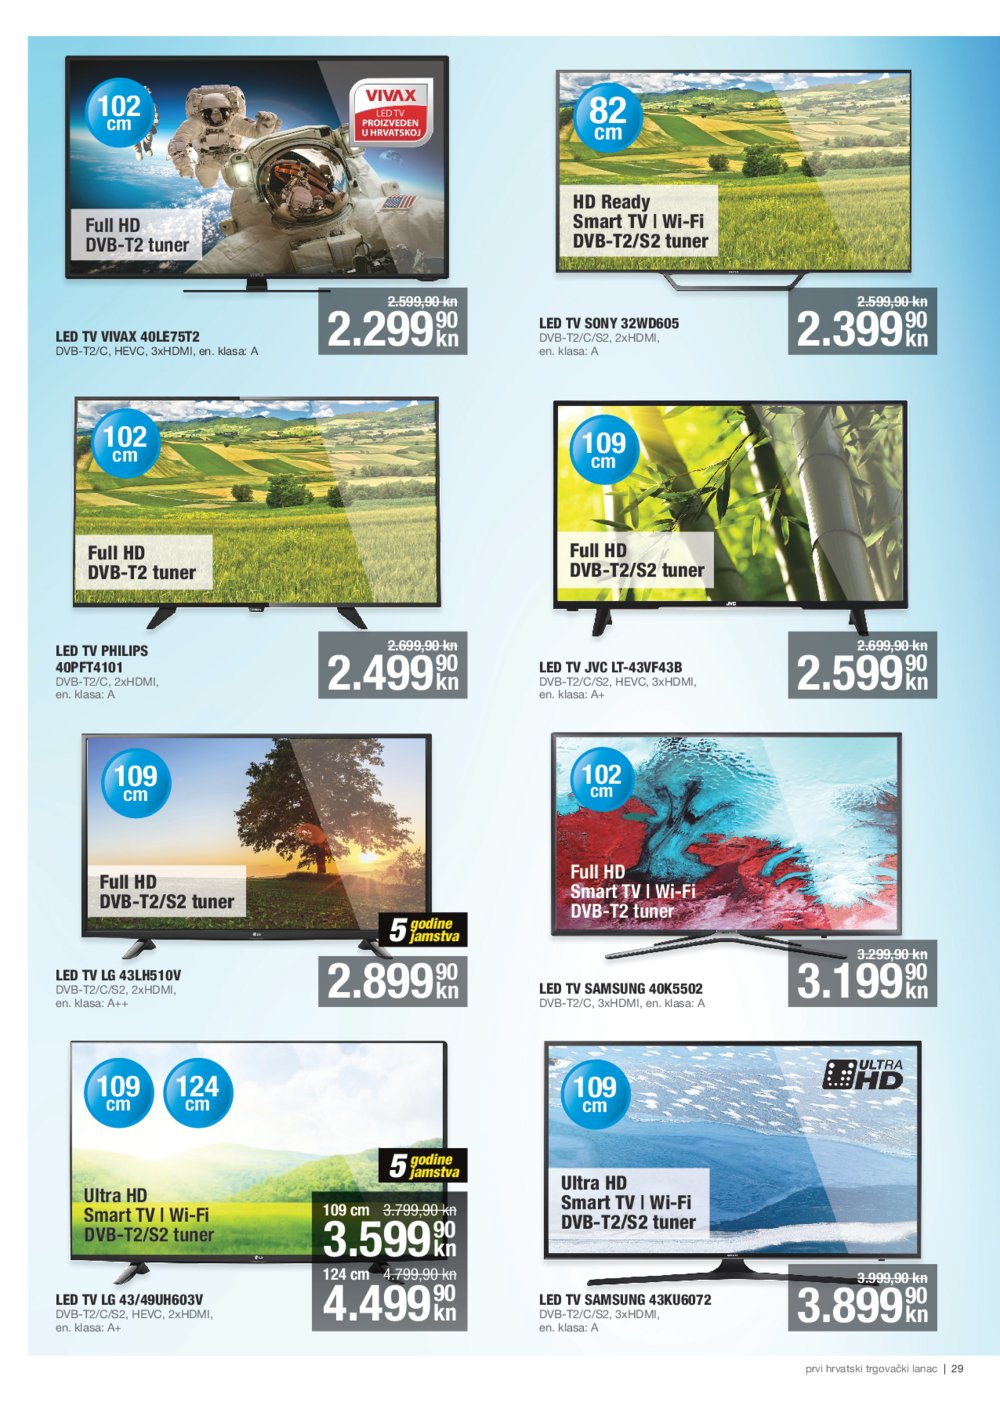 Pevec katalog Super ponuda 8.6.-30.6.2017.